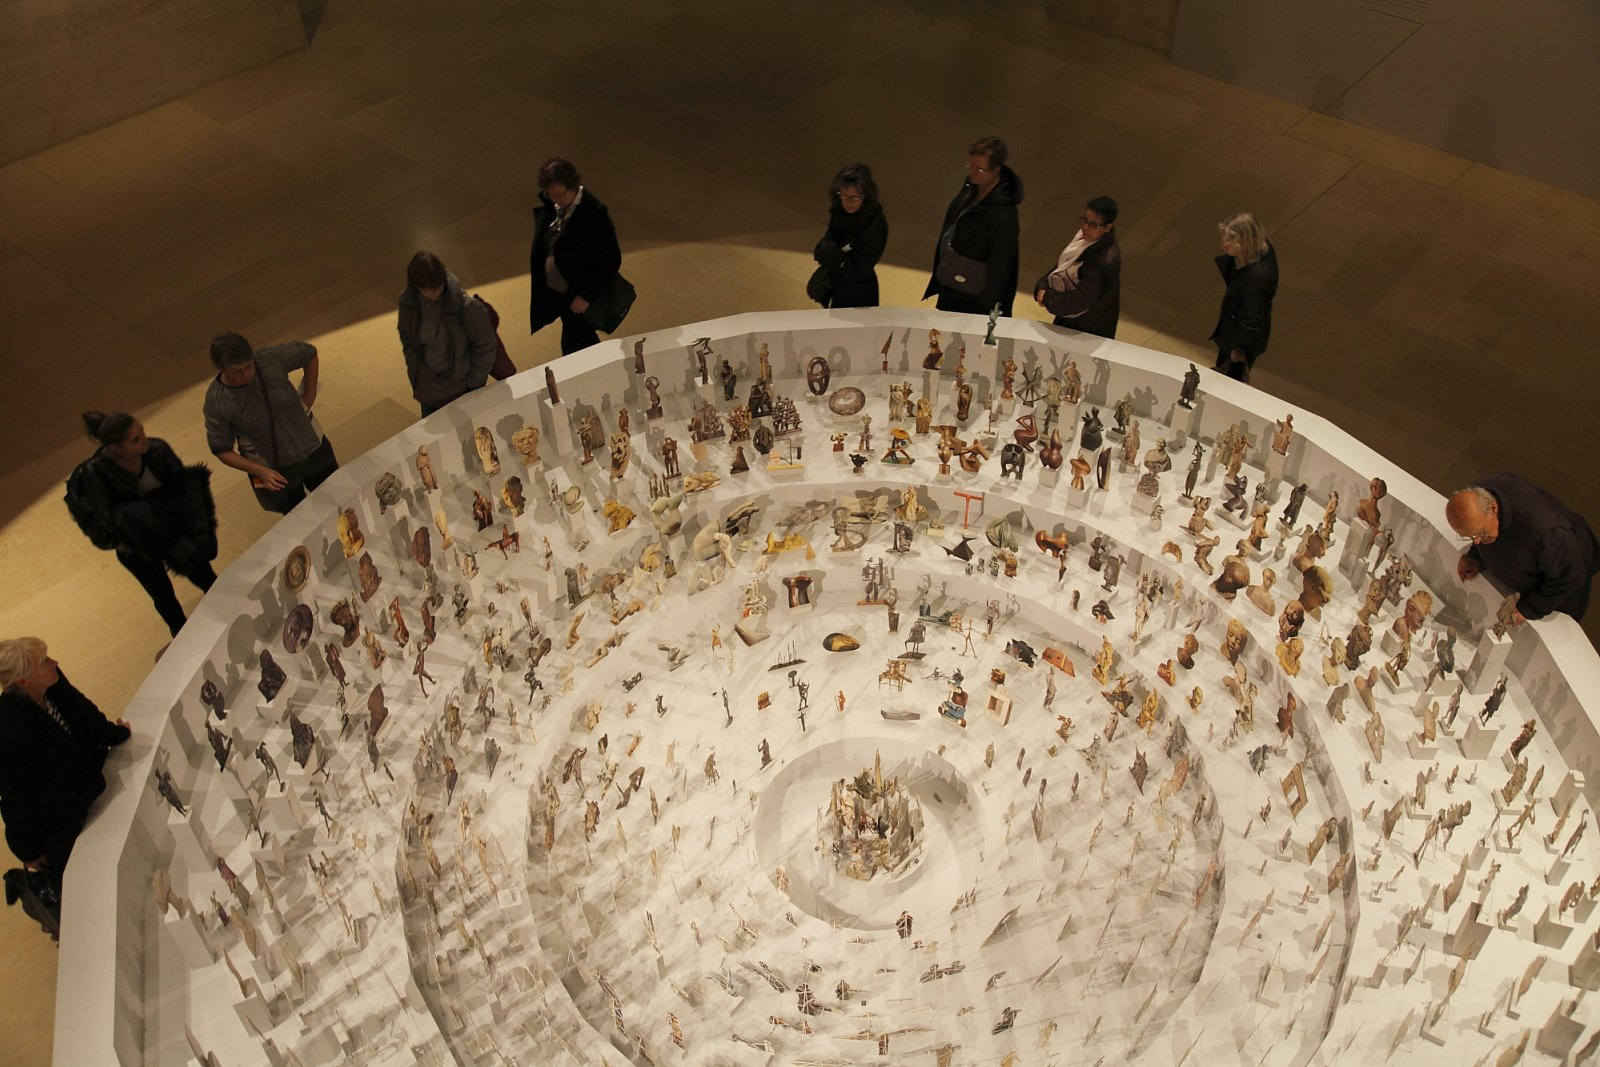 Geoffrey Farmer, Boneyard, 2013, paper cutouts, wood, glue, dimensions variable. Installation view, A Brief History of the Future, Musée du Louvre, Paris, 2015 by Geoffrey Farmer